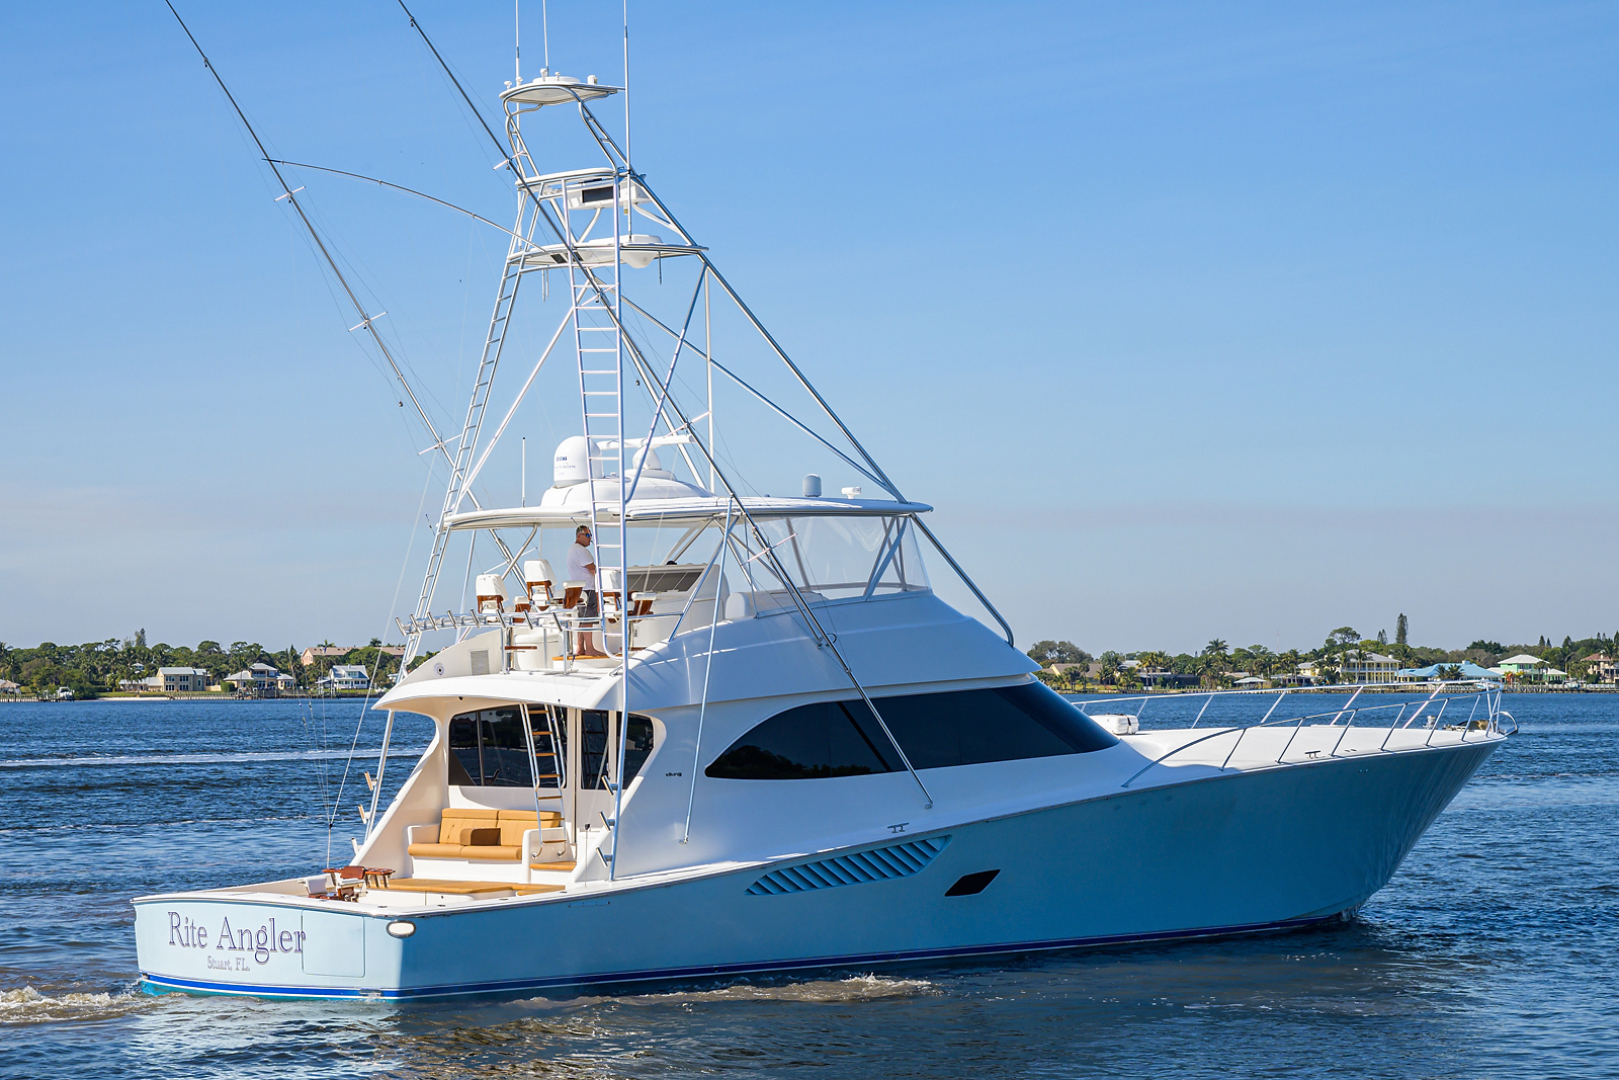 Viking-Convertible  2010-RITE ANGLER Stuart-Florida-United States-RITE ANGLER-1601797 | Thumbnail